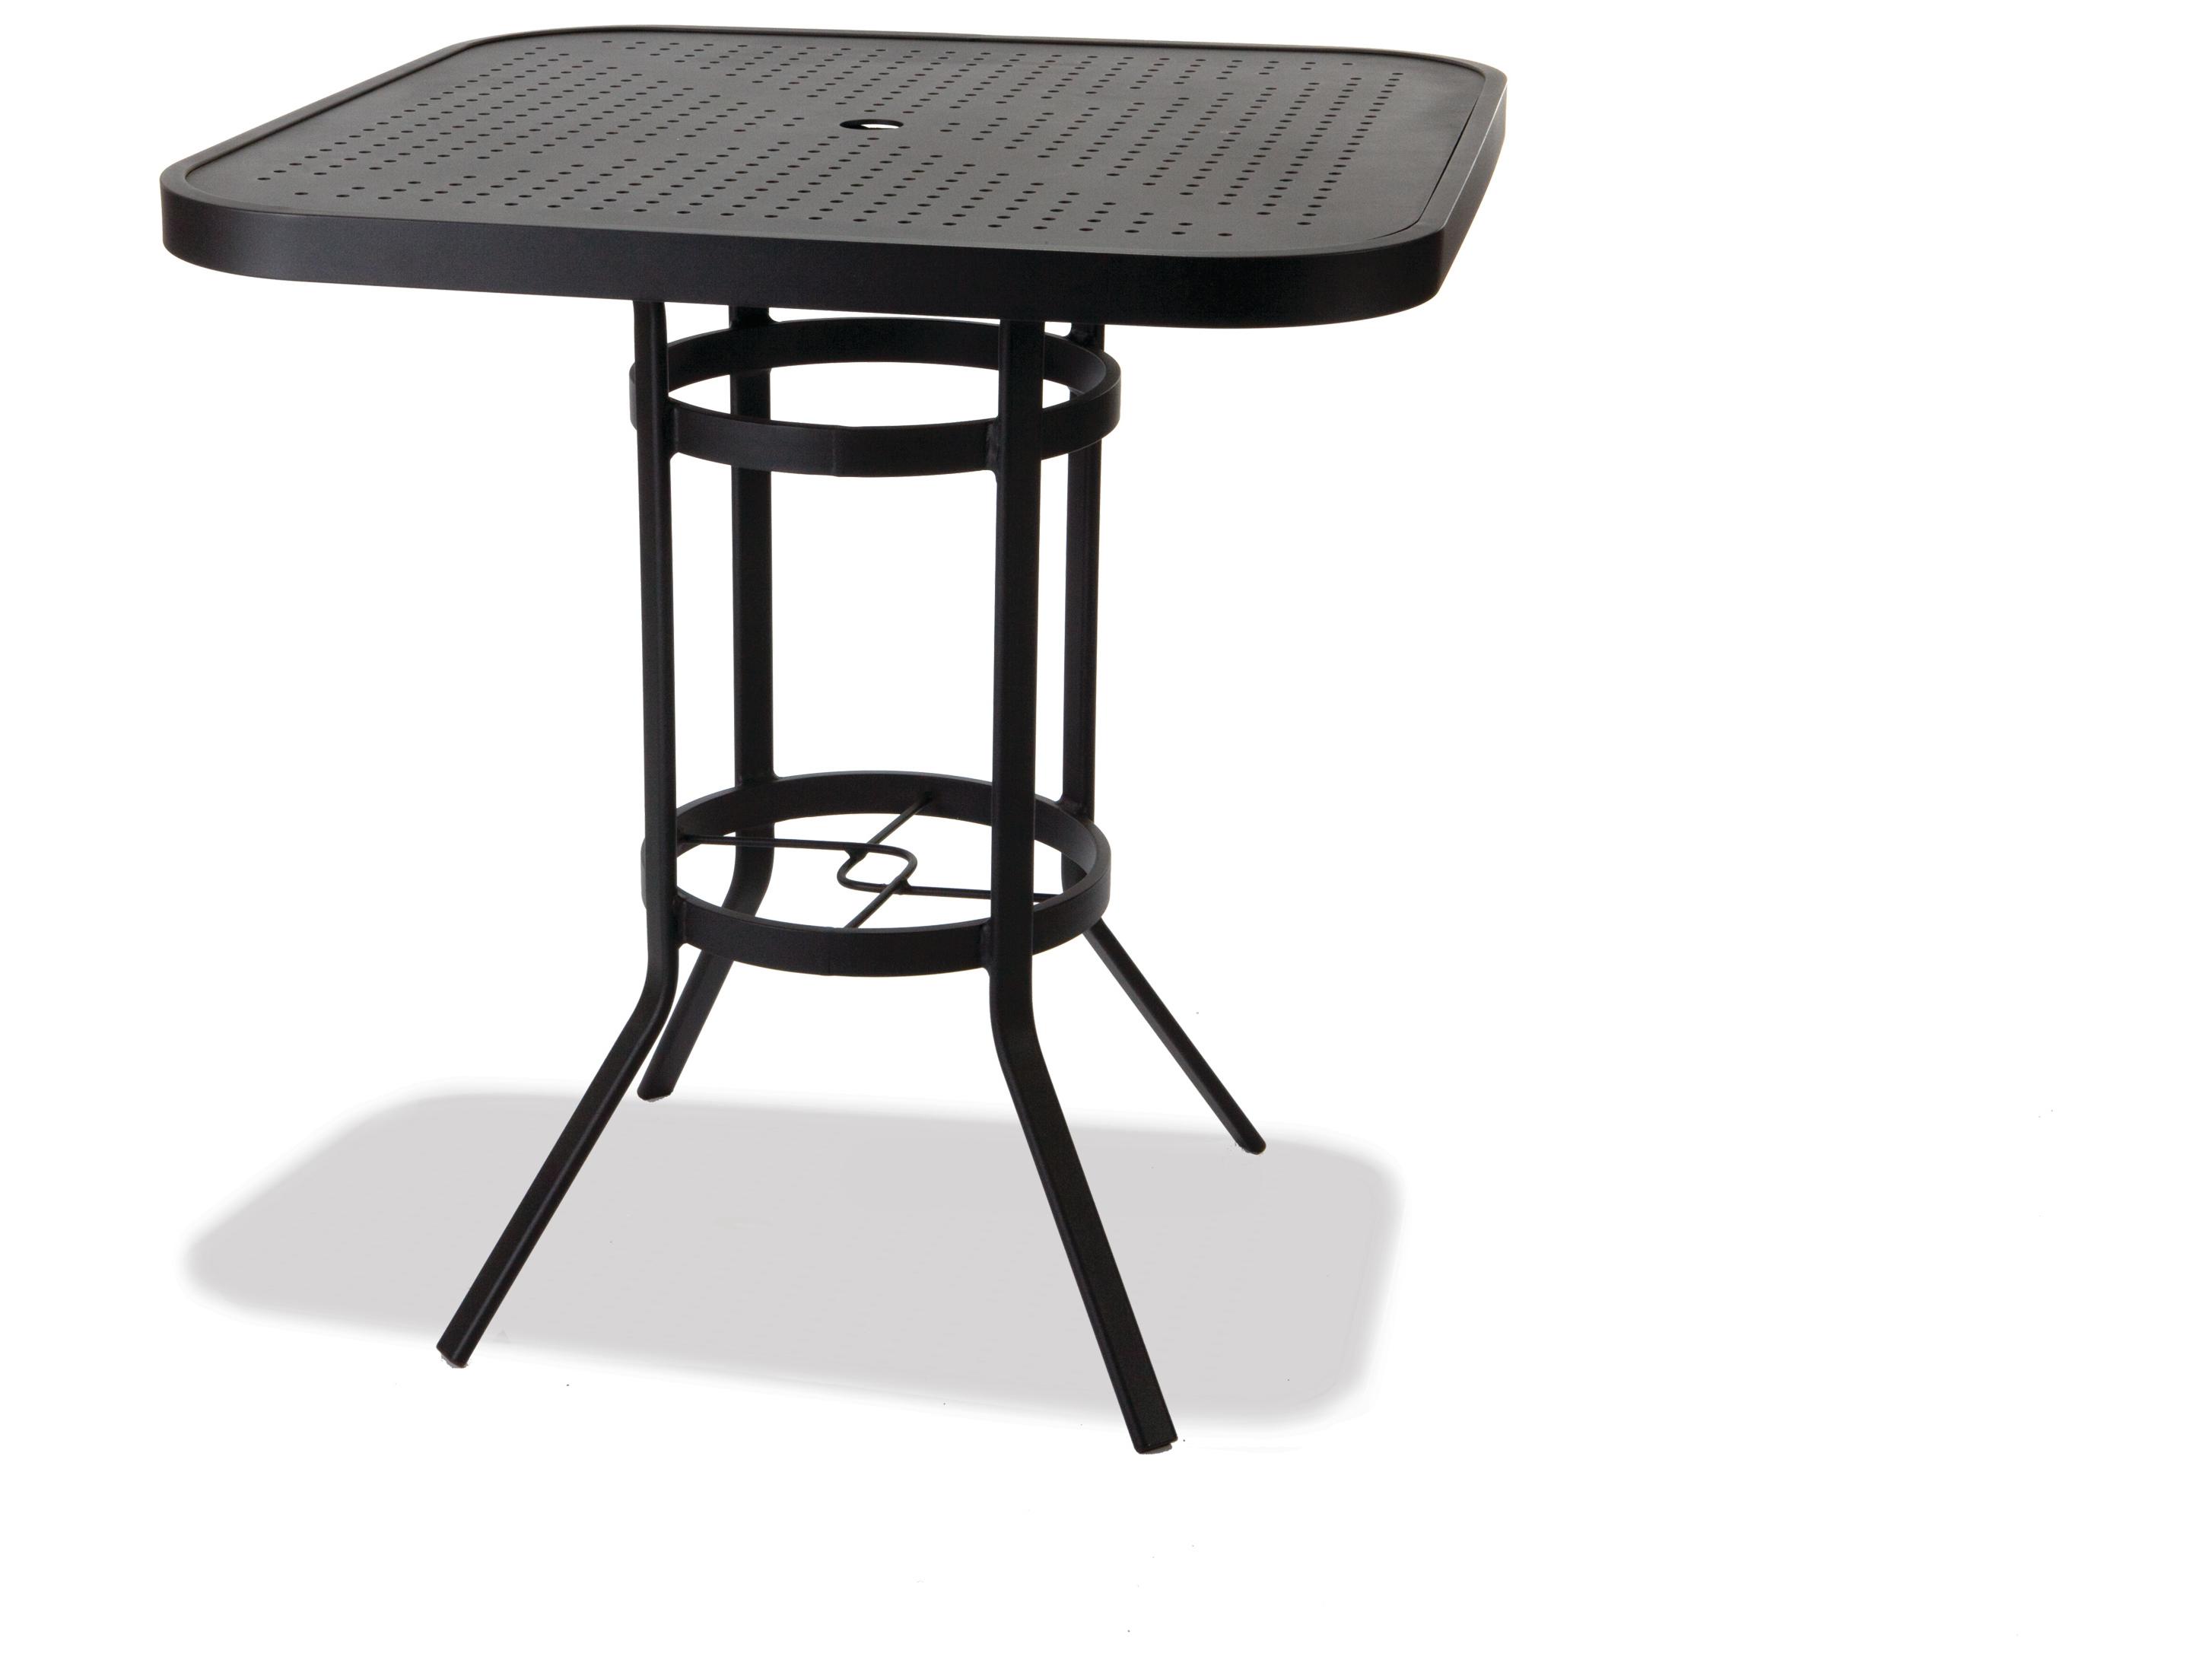 Winston stamped aluminum 36 39 39 square metal bar table with - Aluminium picnic table with umbrella ...